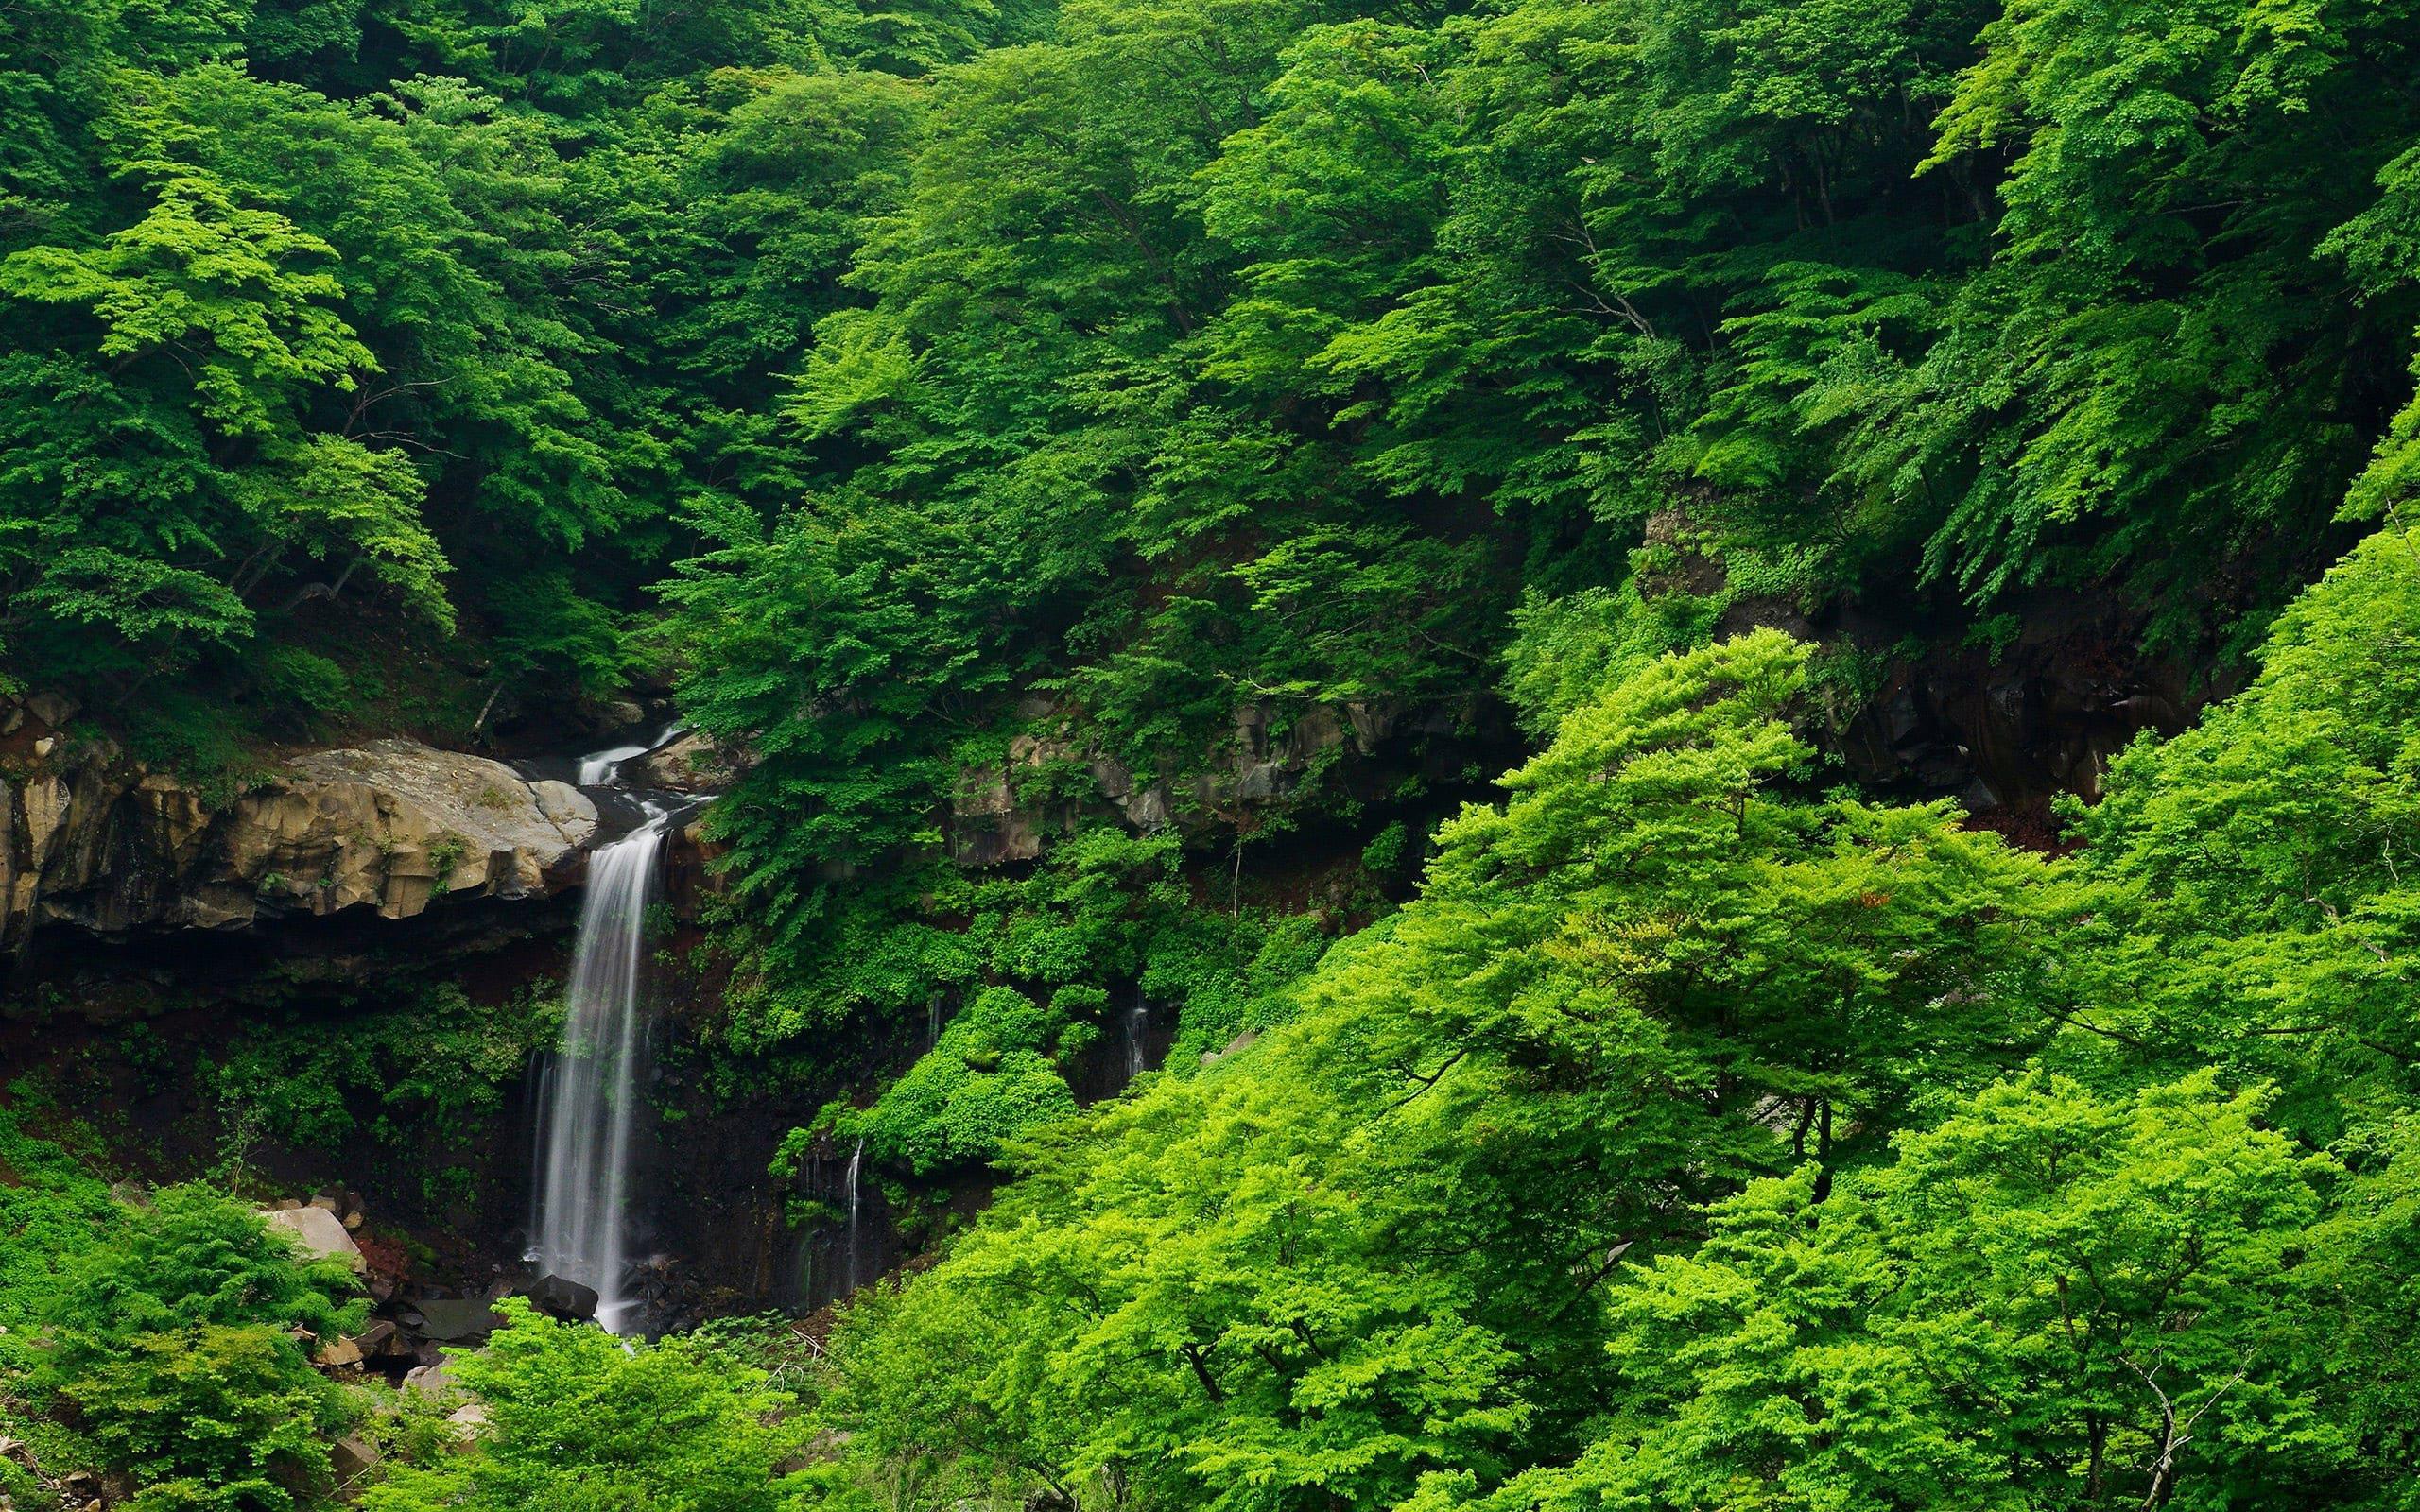 HDoboi.Kiev.ua - Маленький водопад в густых зеленых зарослях